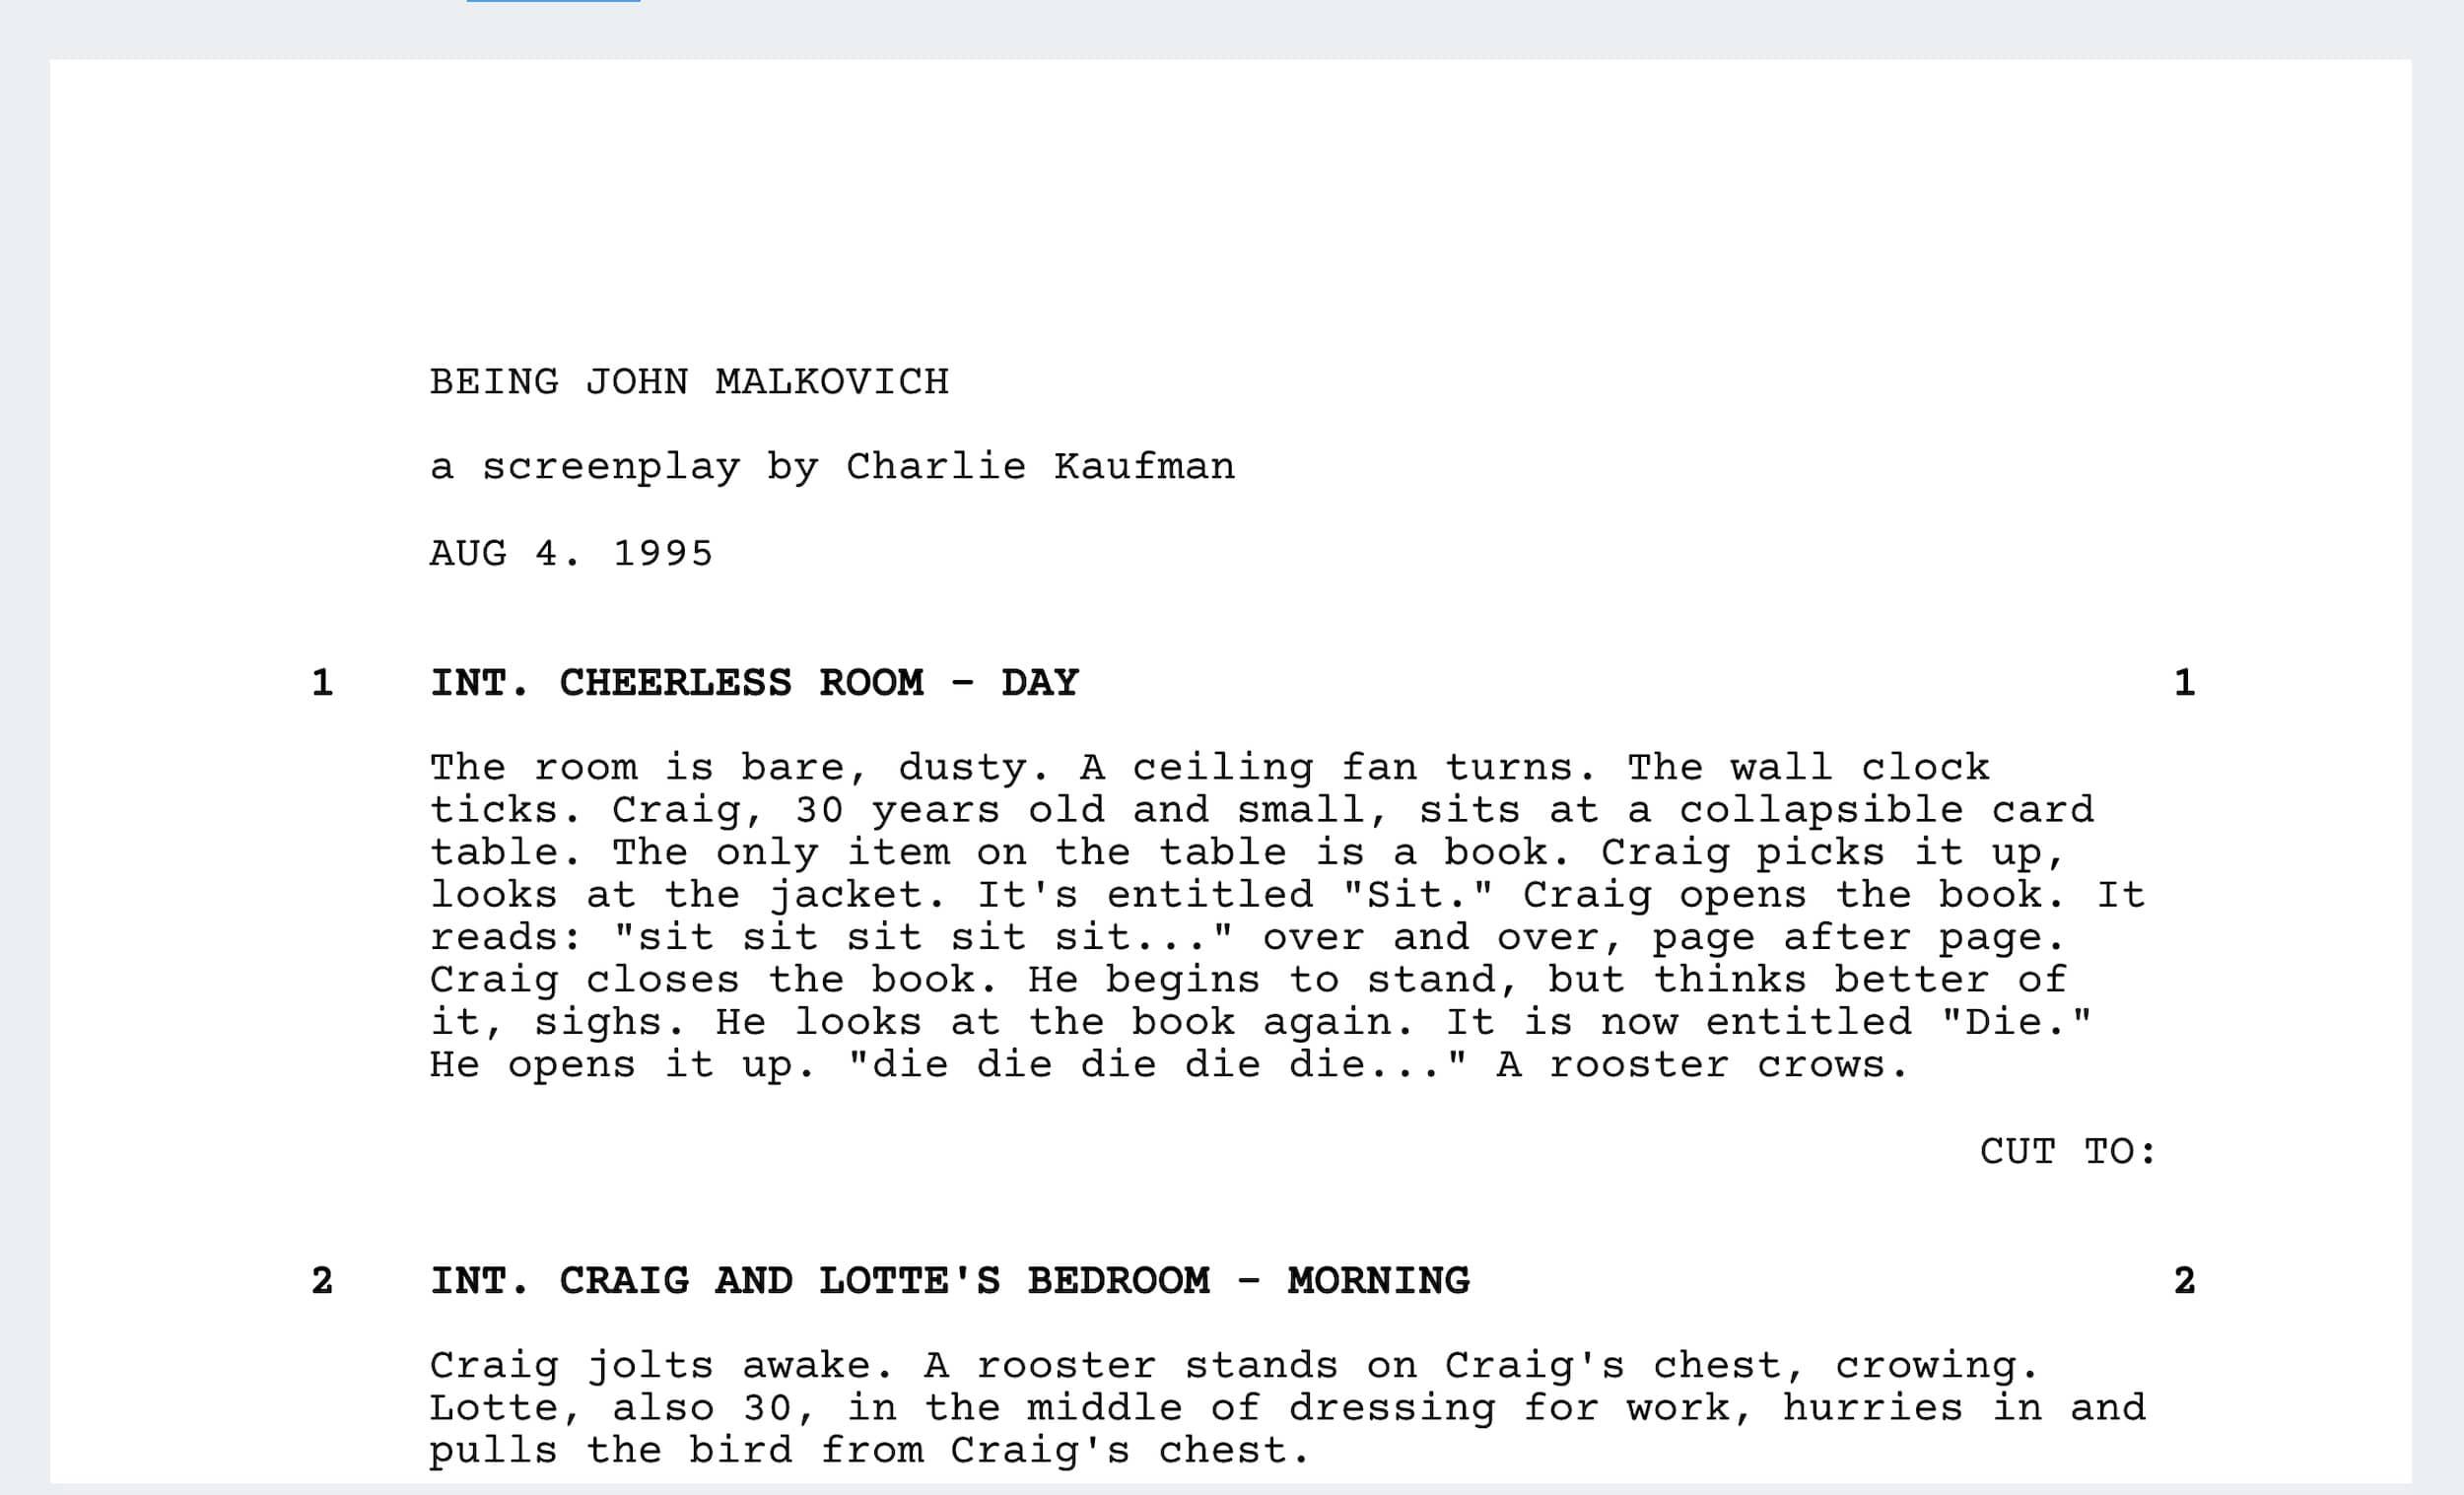 Best Charlie Kaufman Movies - Being John Malkovich - StudioBinder